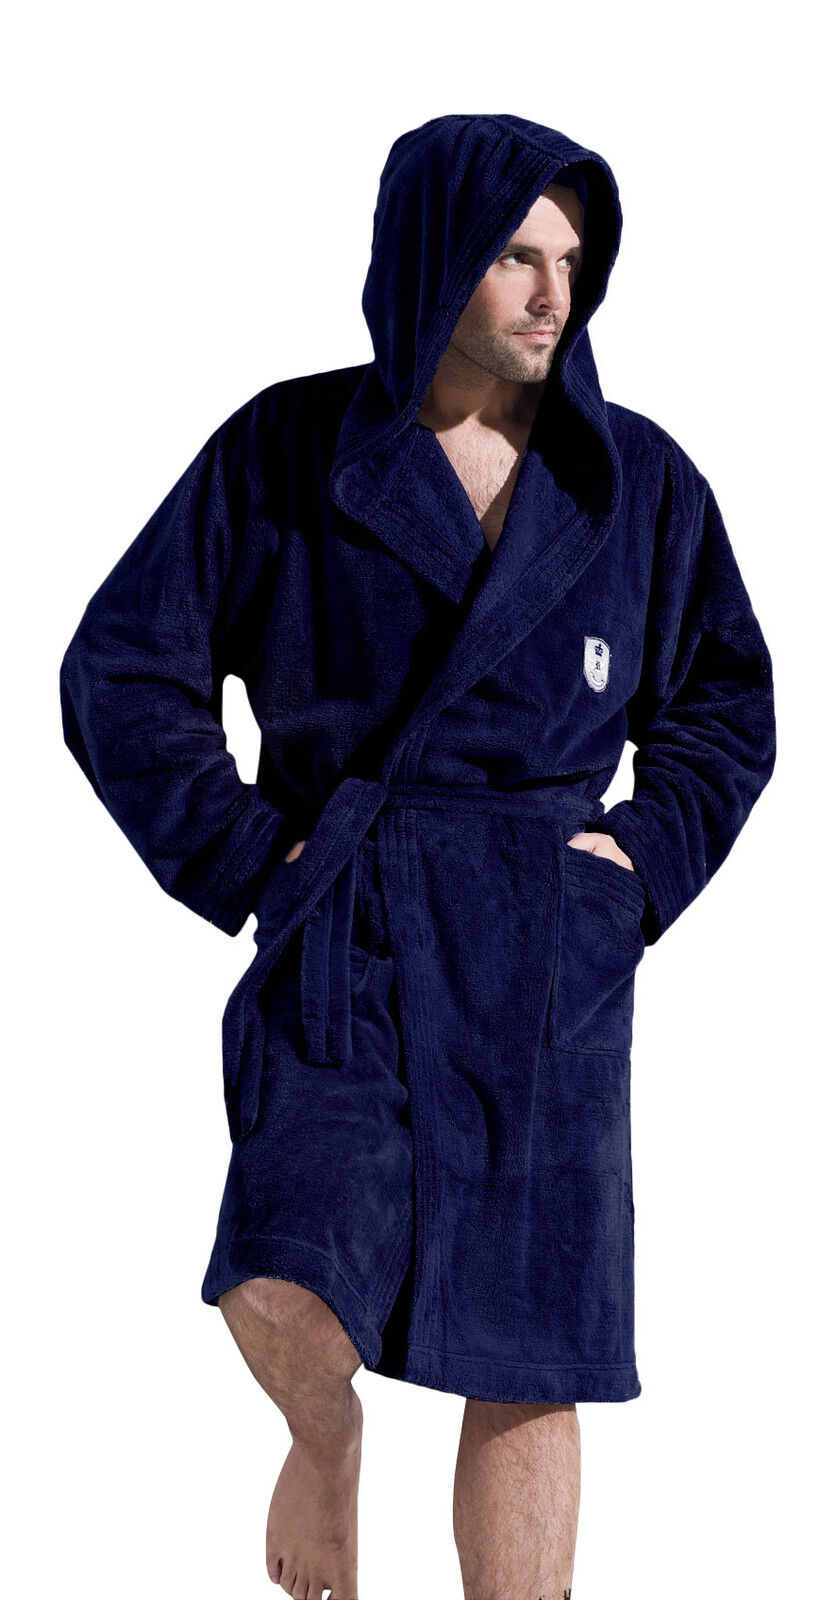 Men Gents Luxury SOFT Bath Robe Housecoat Dressing Gown Bathrobe ...